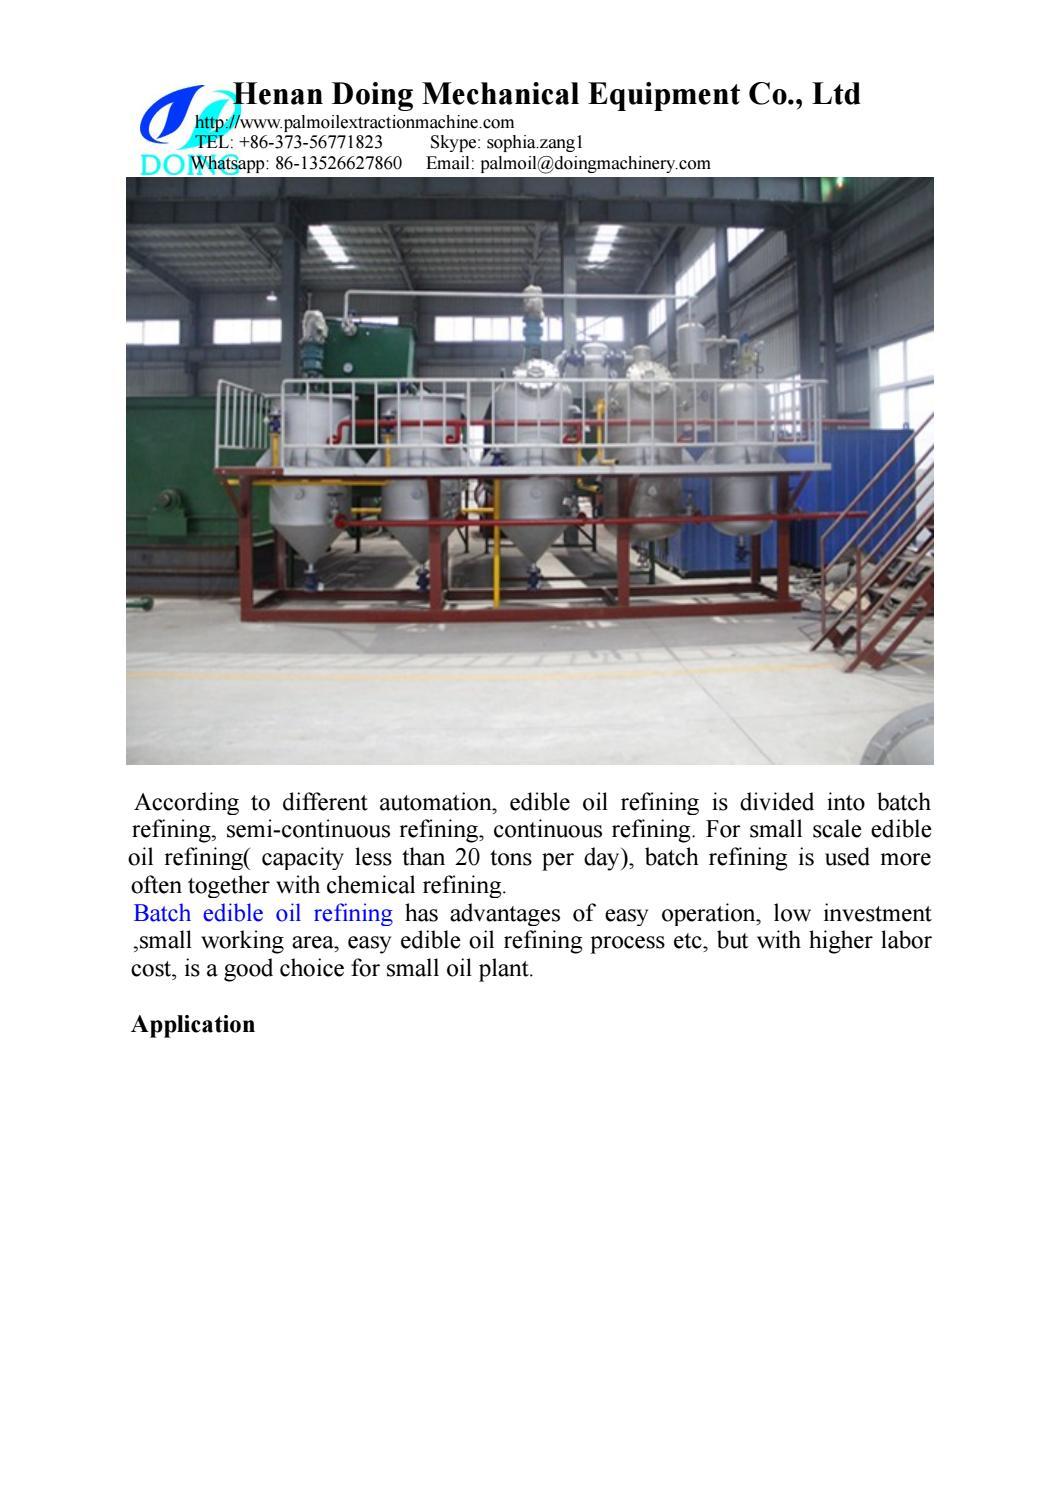 Batch type edible oil refining machine by cookingoilmachine - issuu